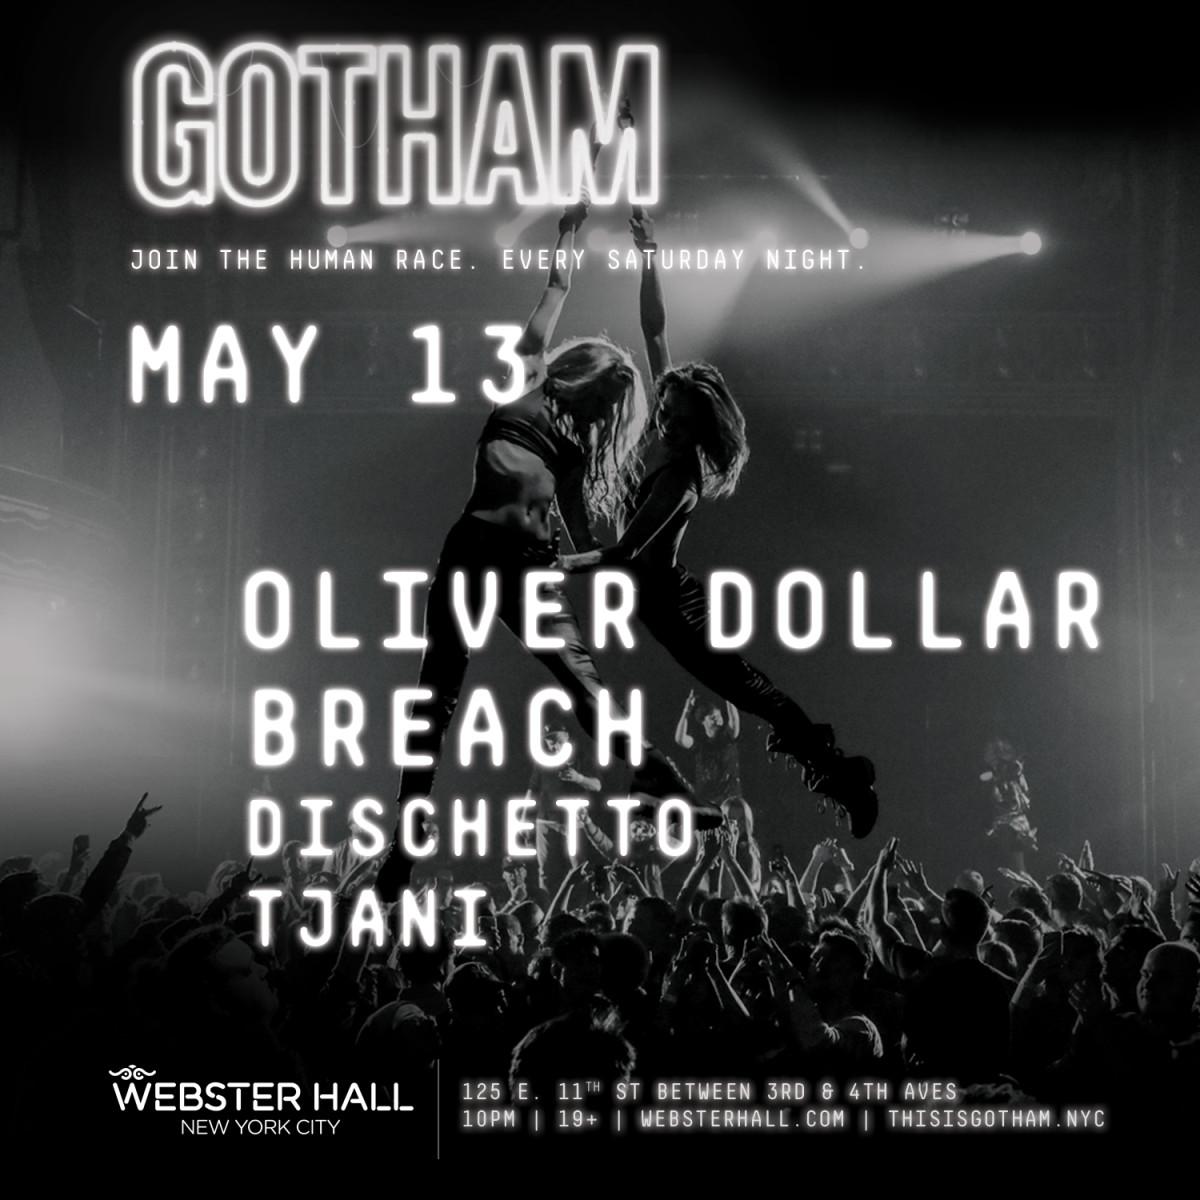 Gotham-May13-sq